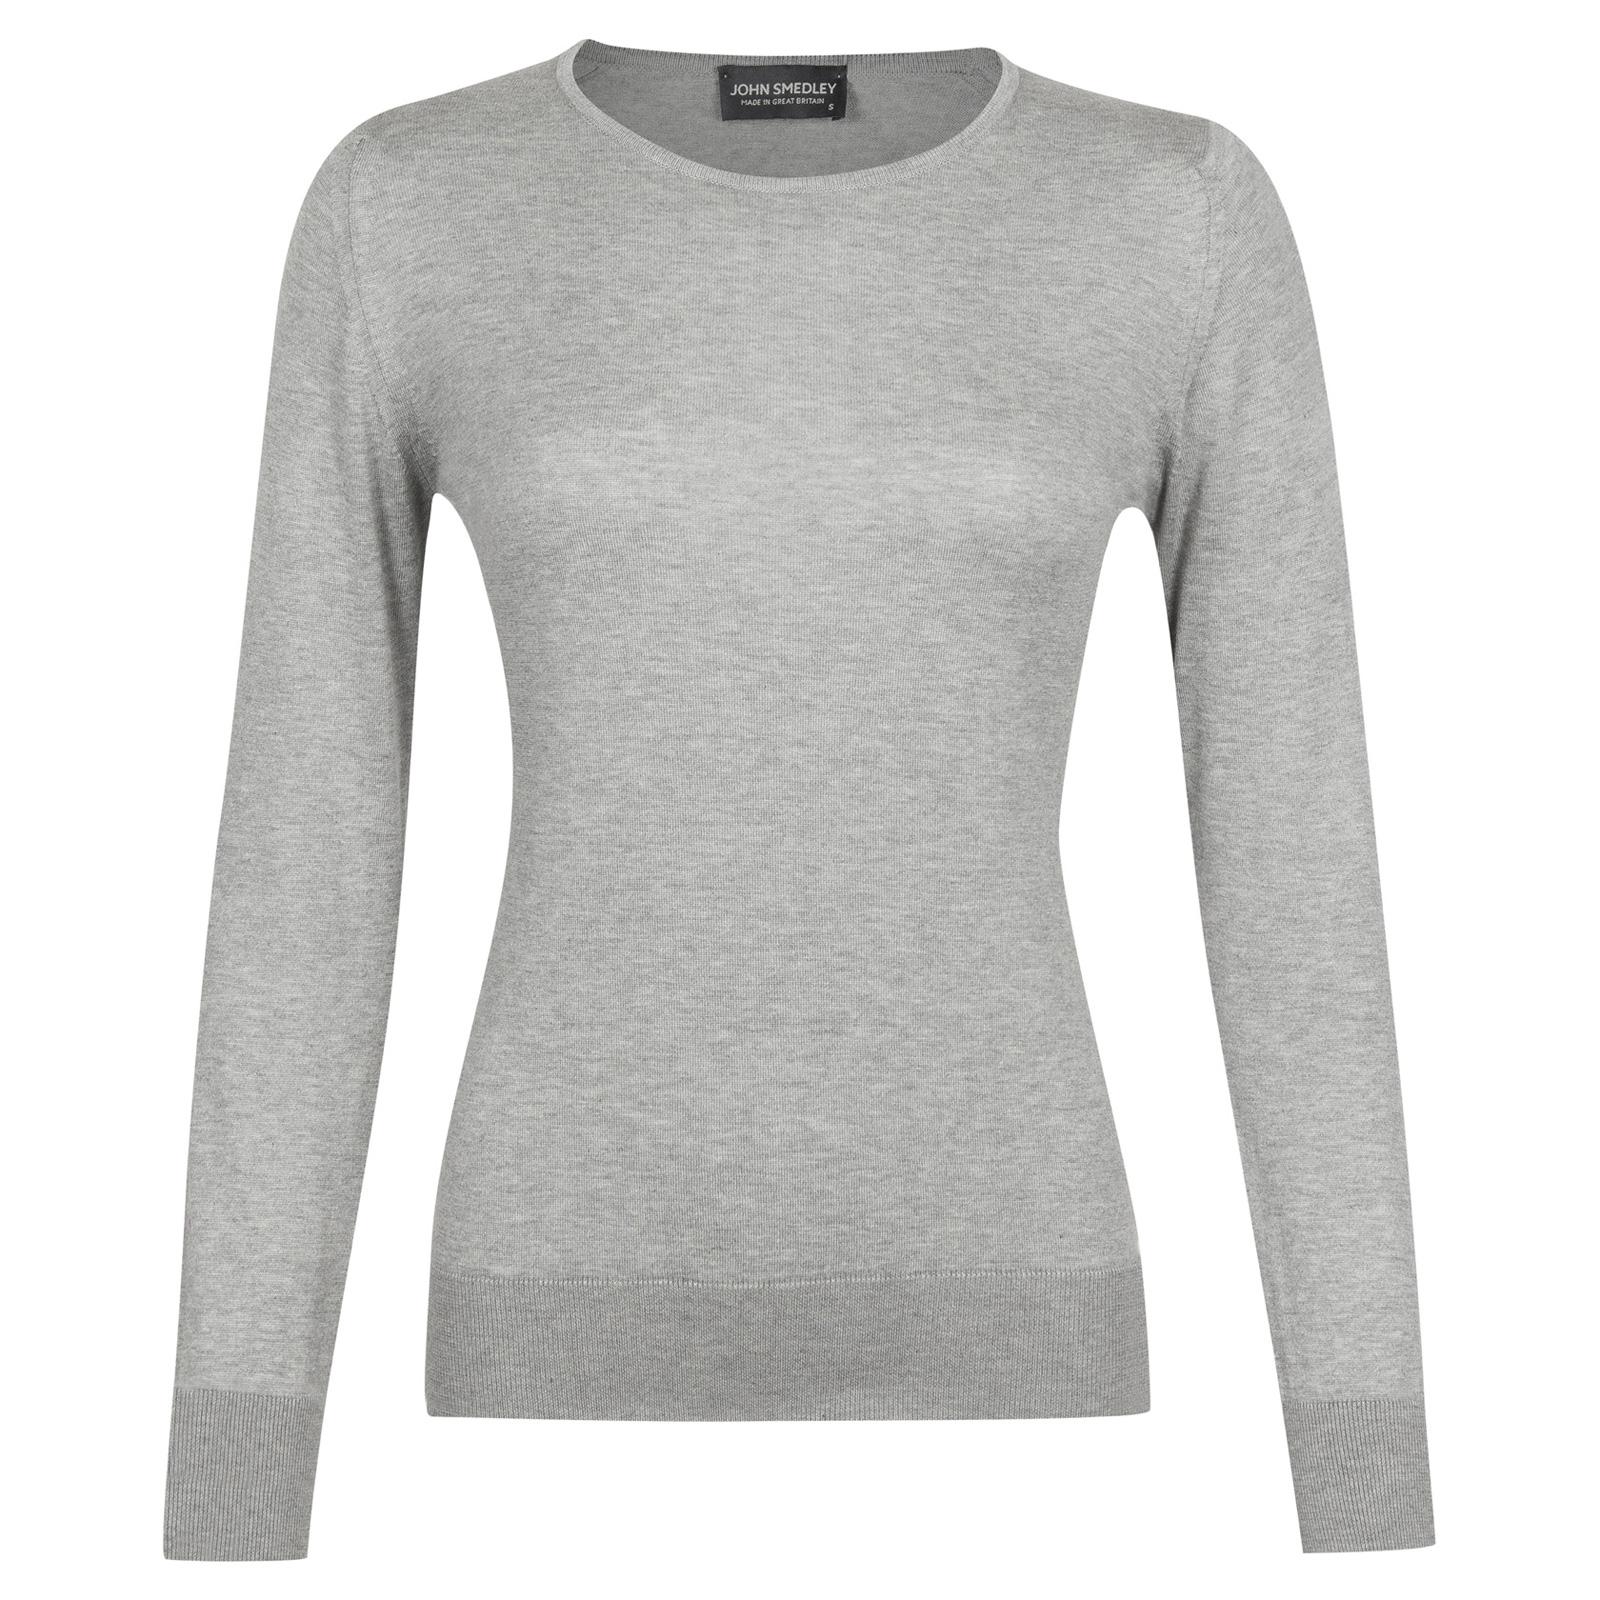 John Smedley paddington Sea Island Cotton Sweater in Silver-S